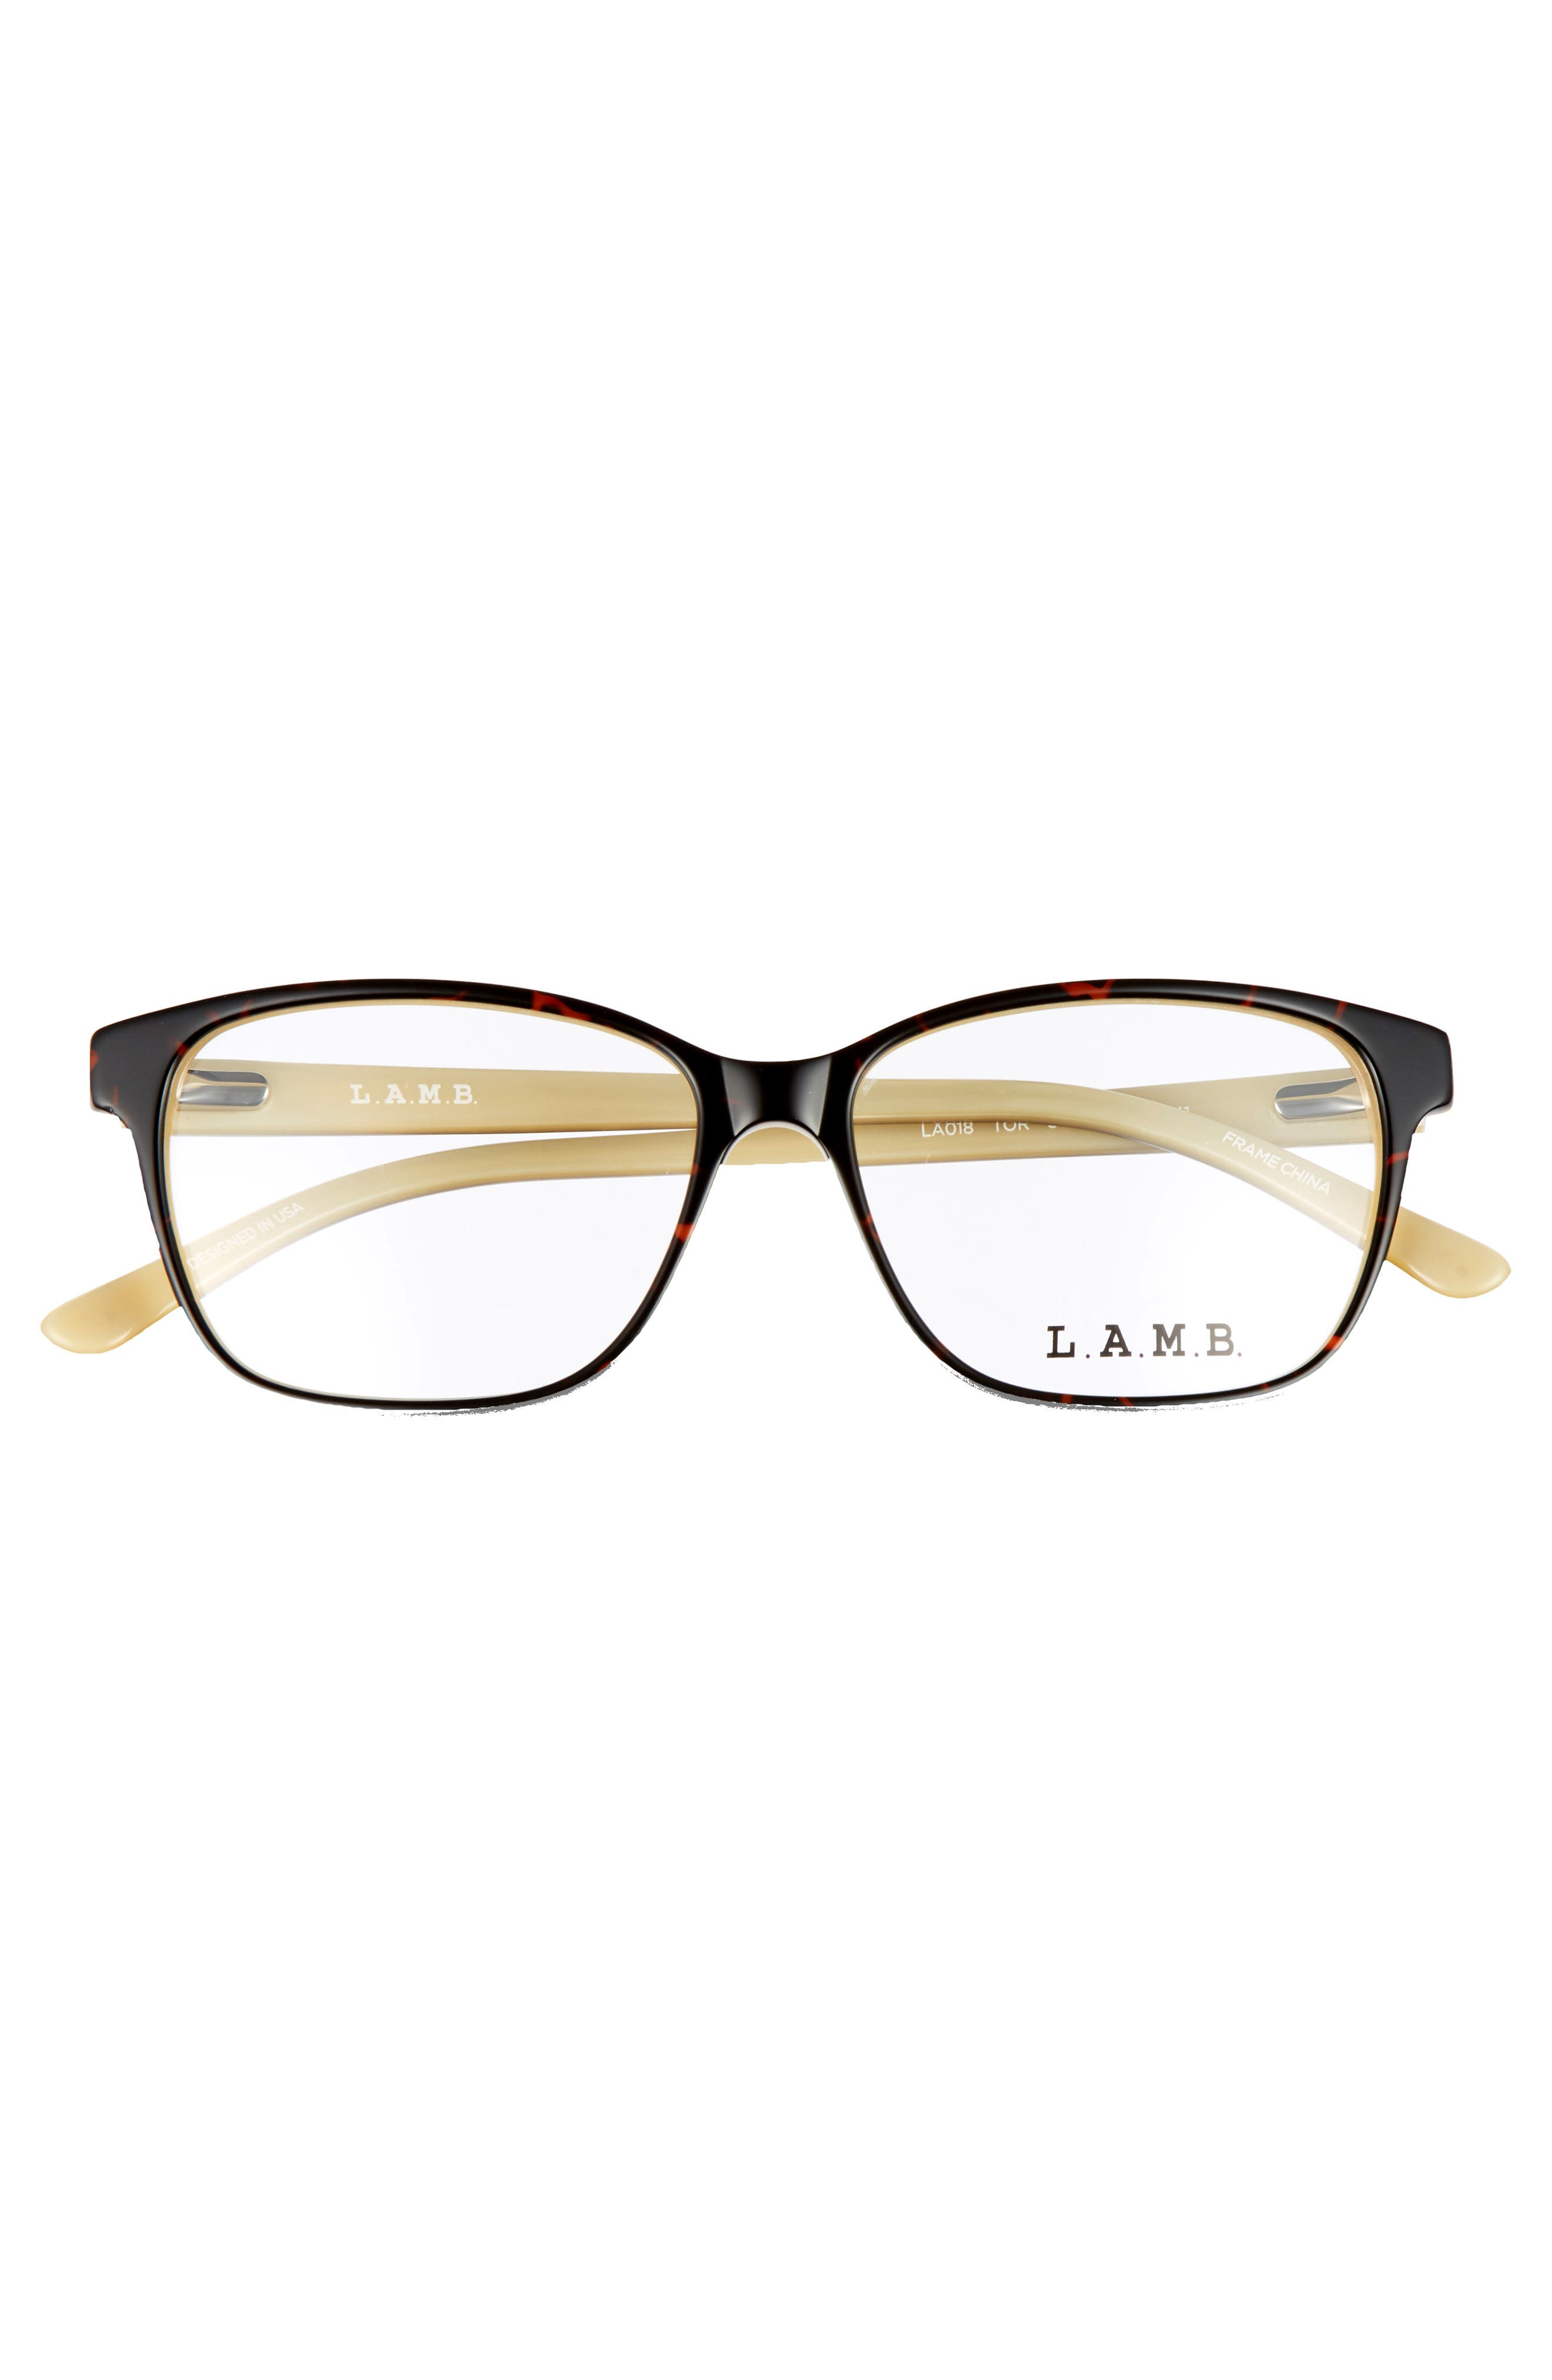 54mm Square Optical Glasses,                             Alternate thumbnail 3, color,                             Yellow